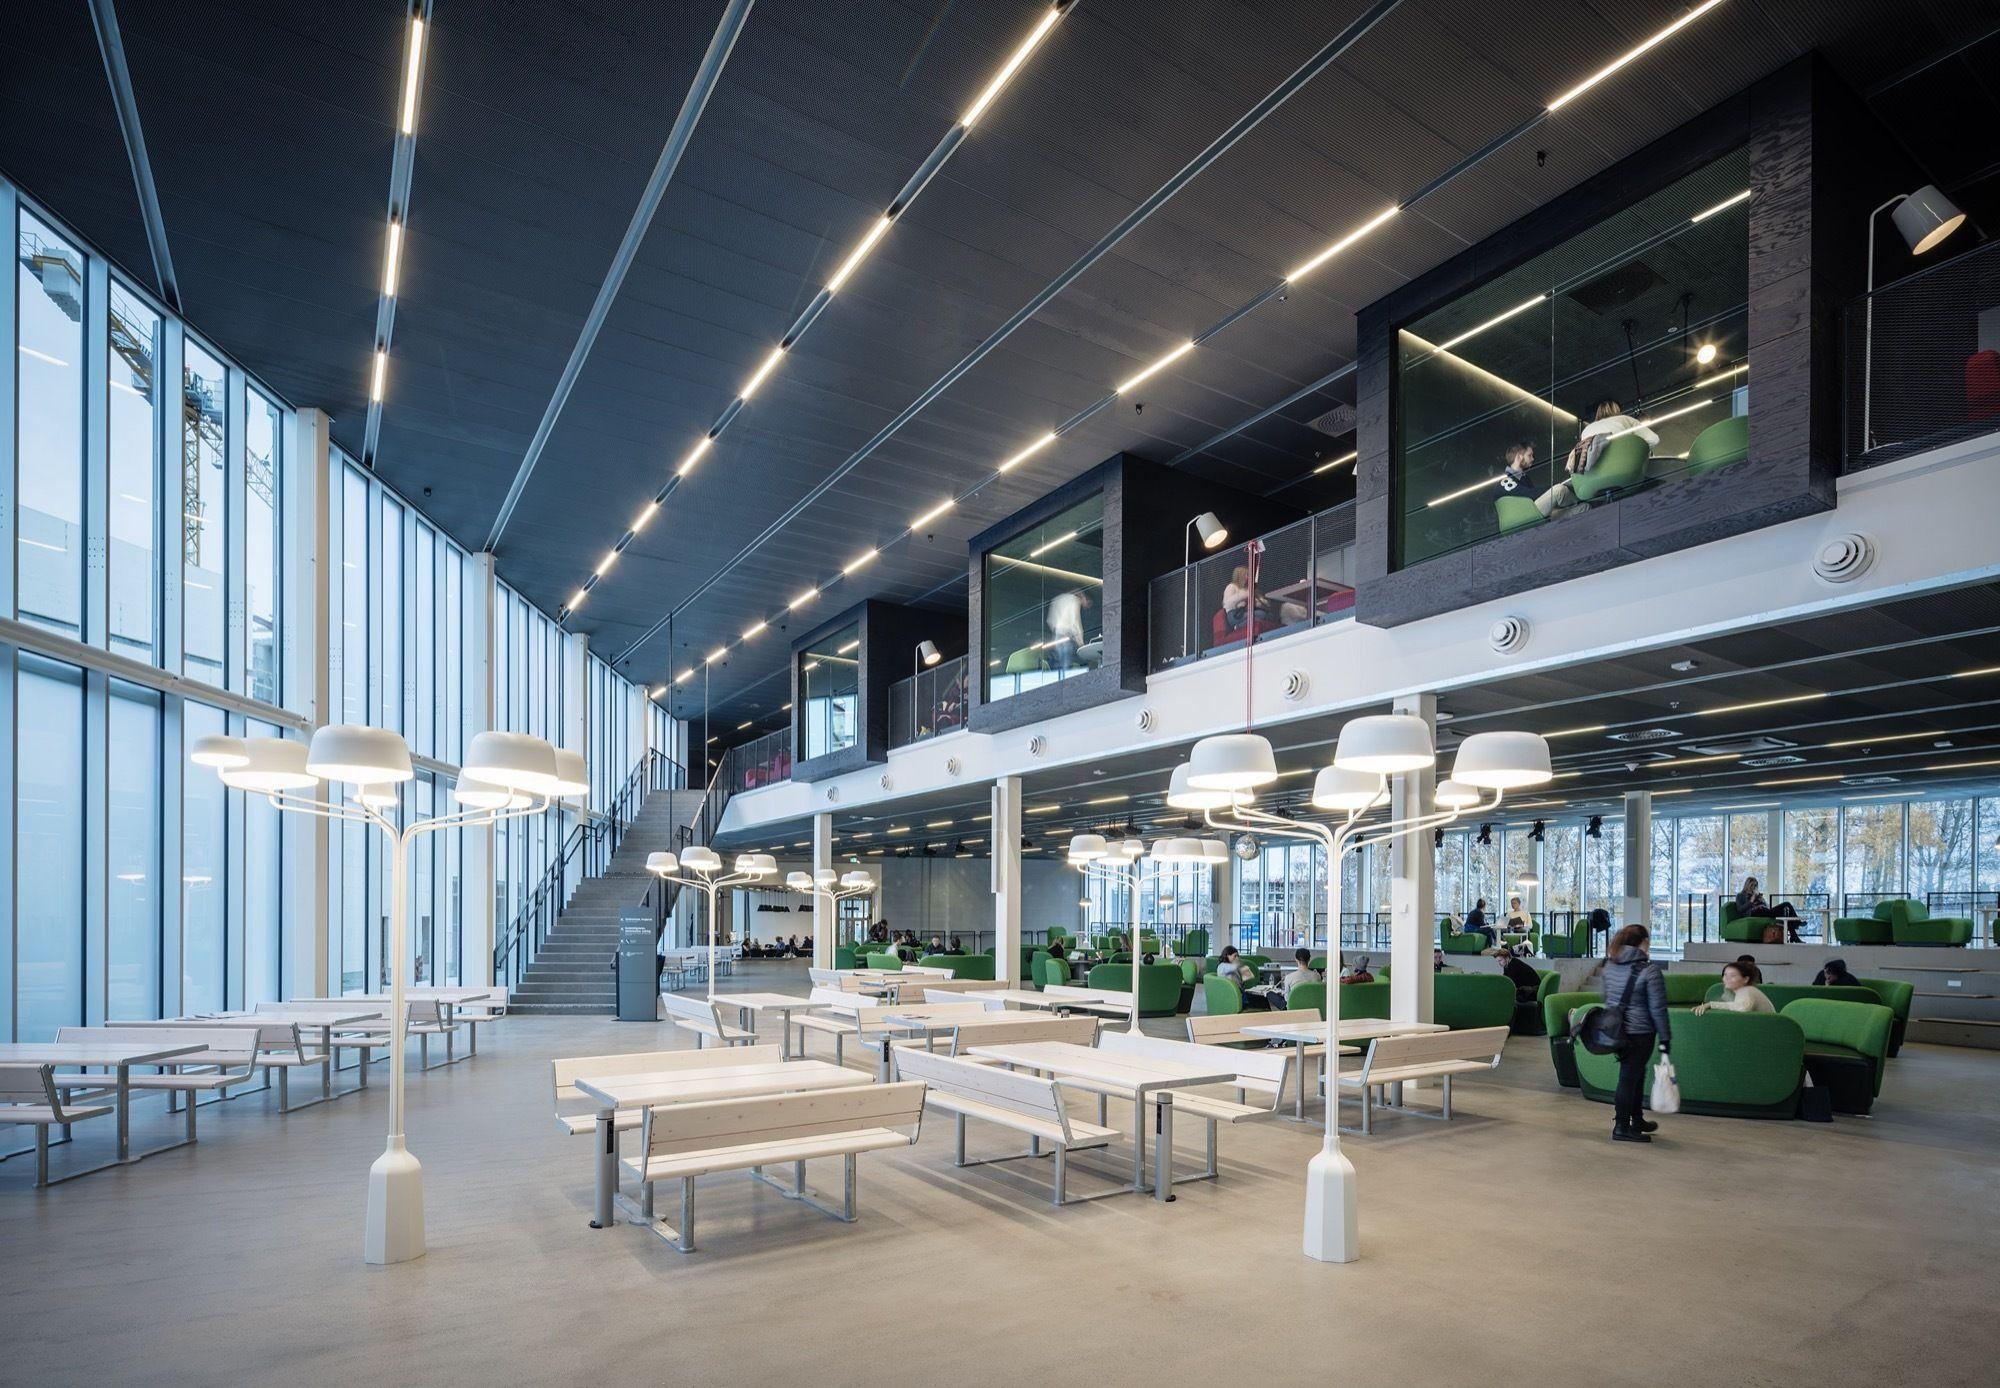 Gallery Of Campus örebro Nova House Juul Frost Architects 5